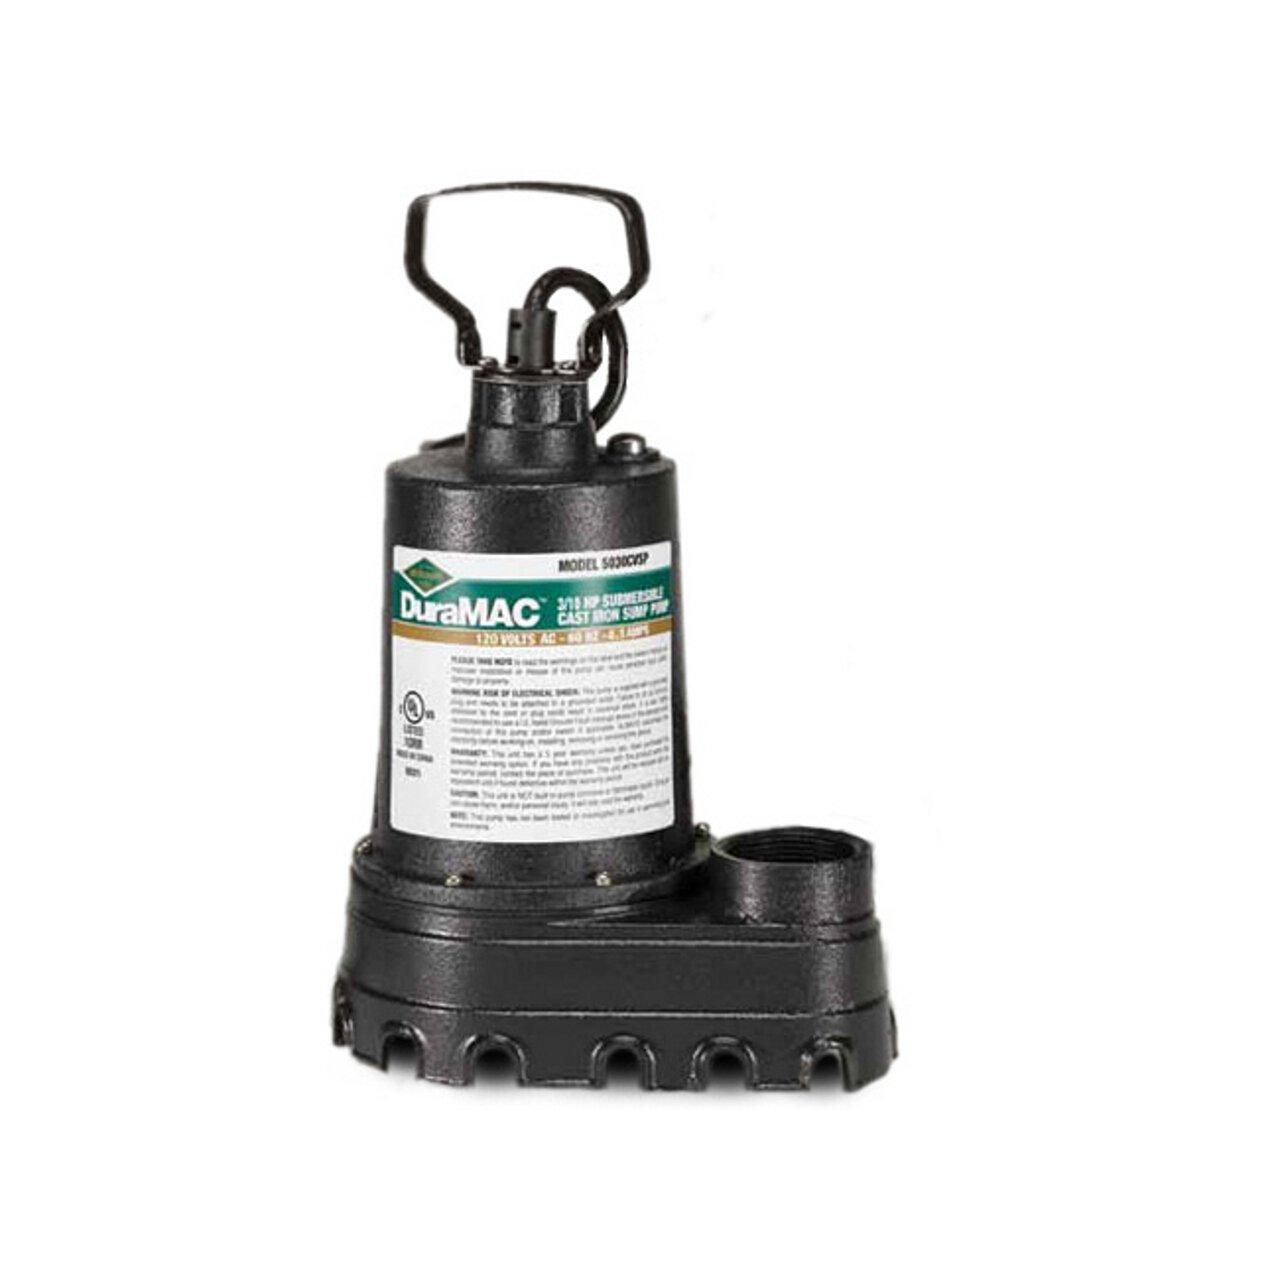 AY McDonald 6190-162 5030CUSP Cast Iron Sump Pump, 3/10 HP